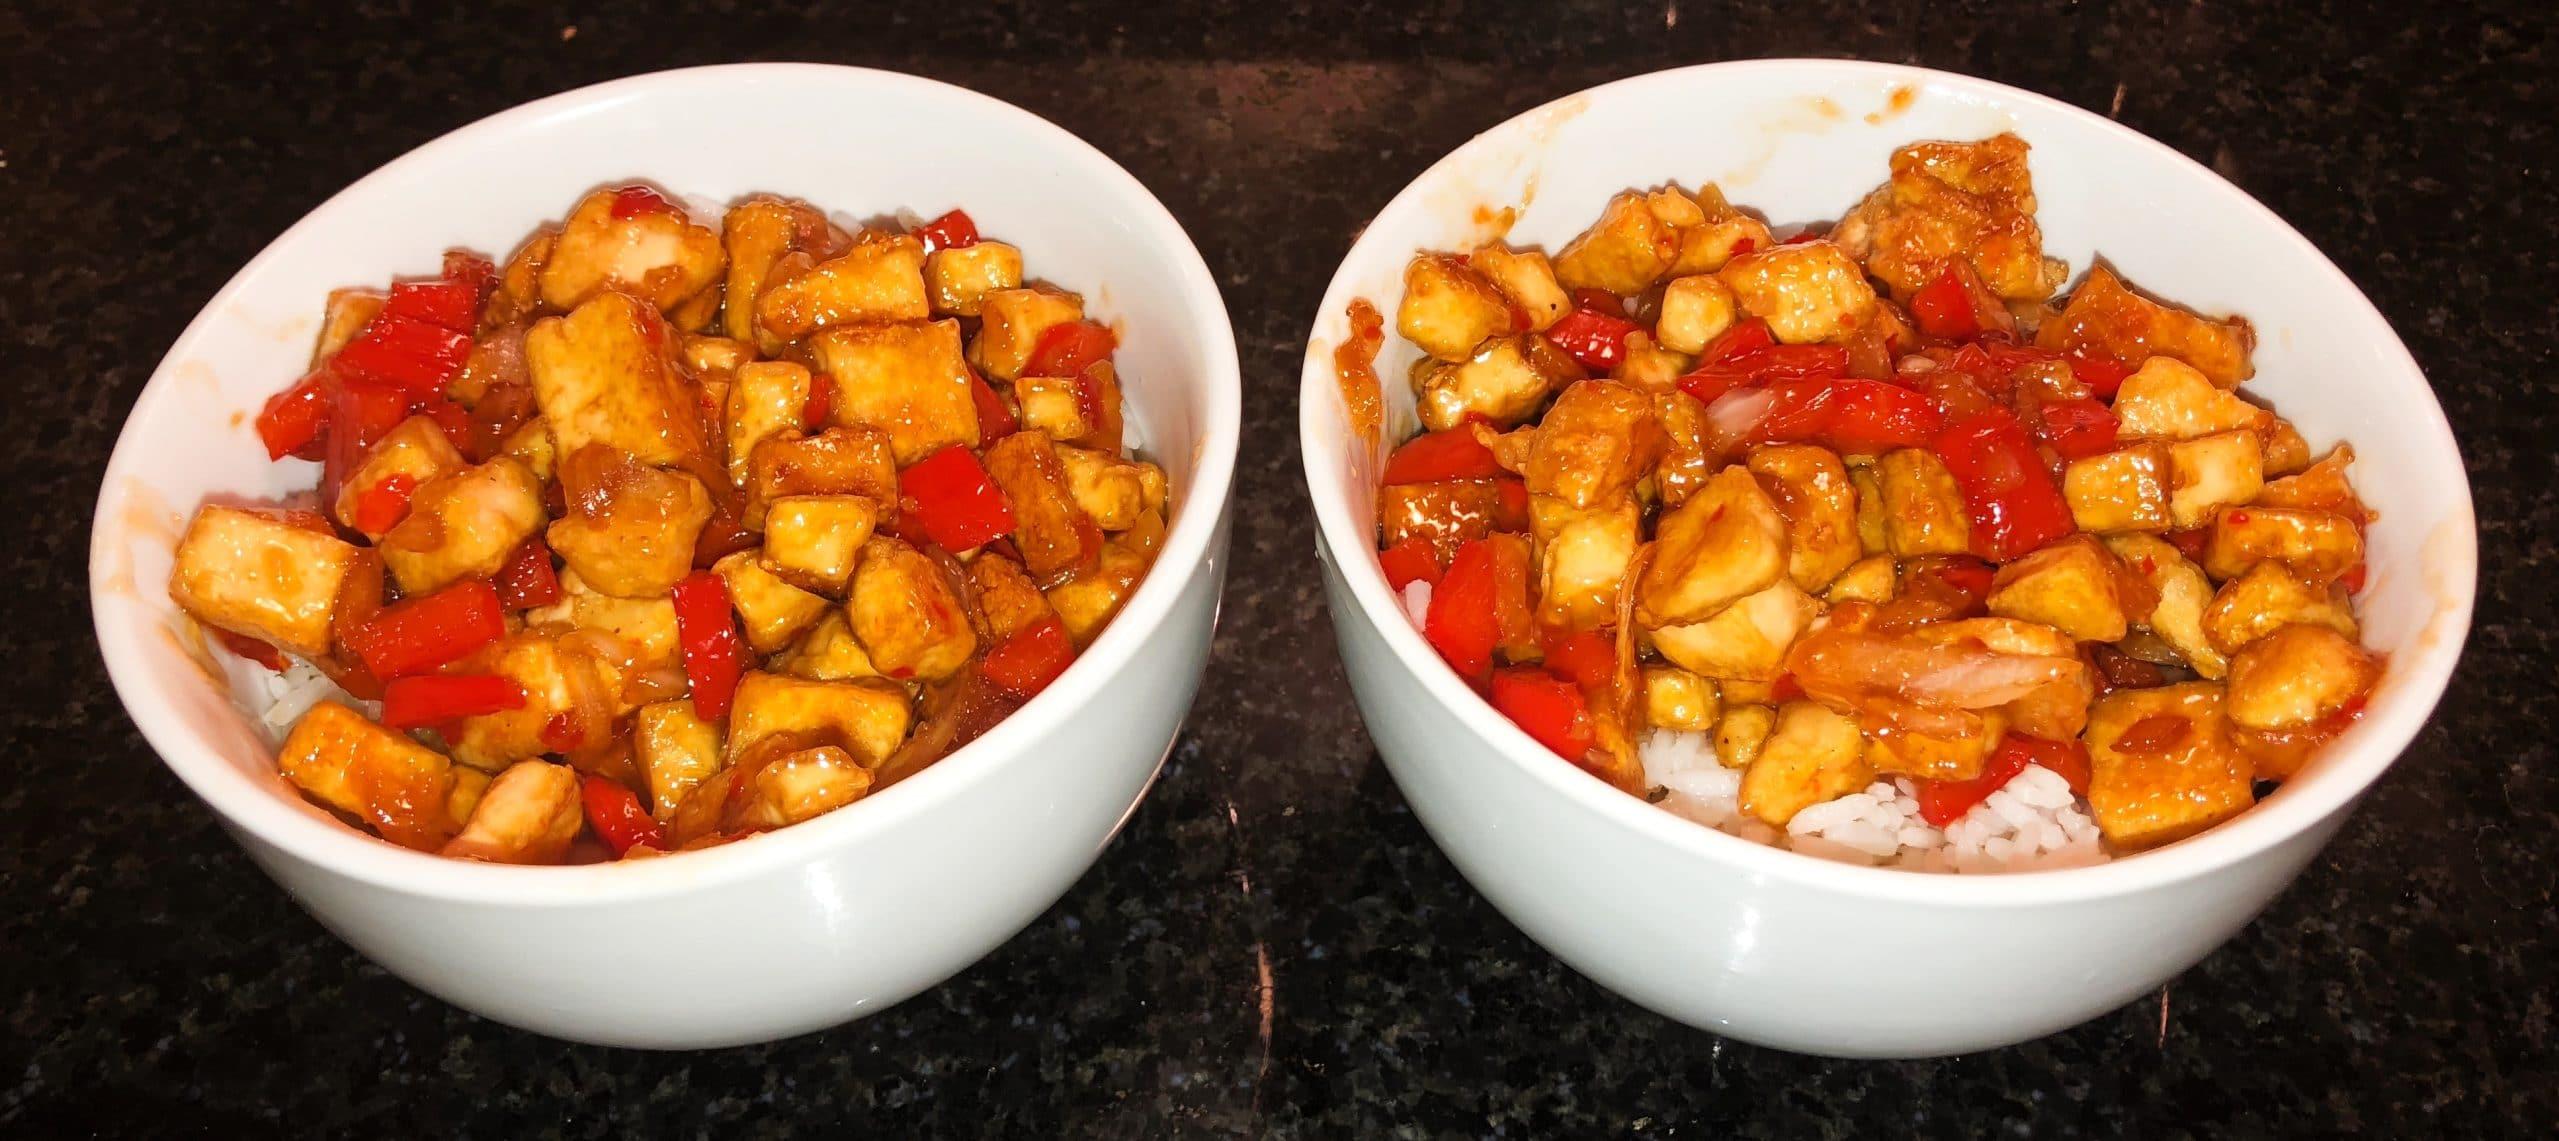 Home Chef Reviews - Sweet Chili Bowls